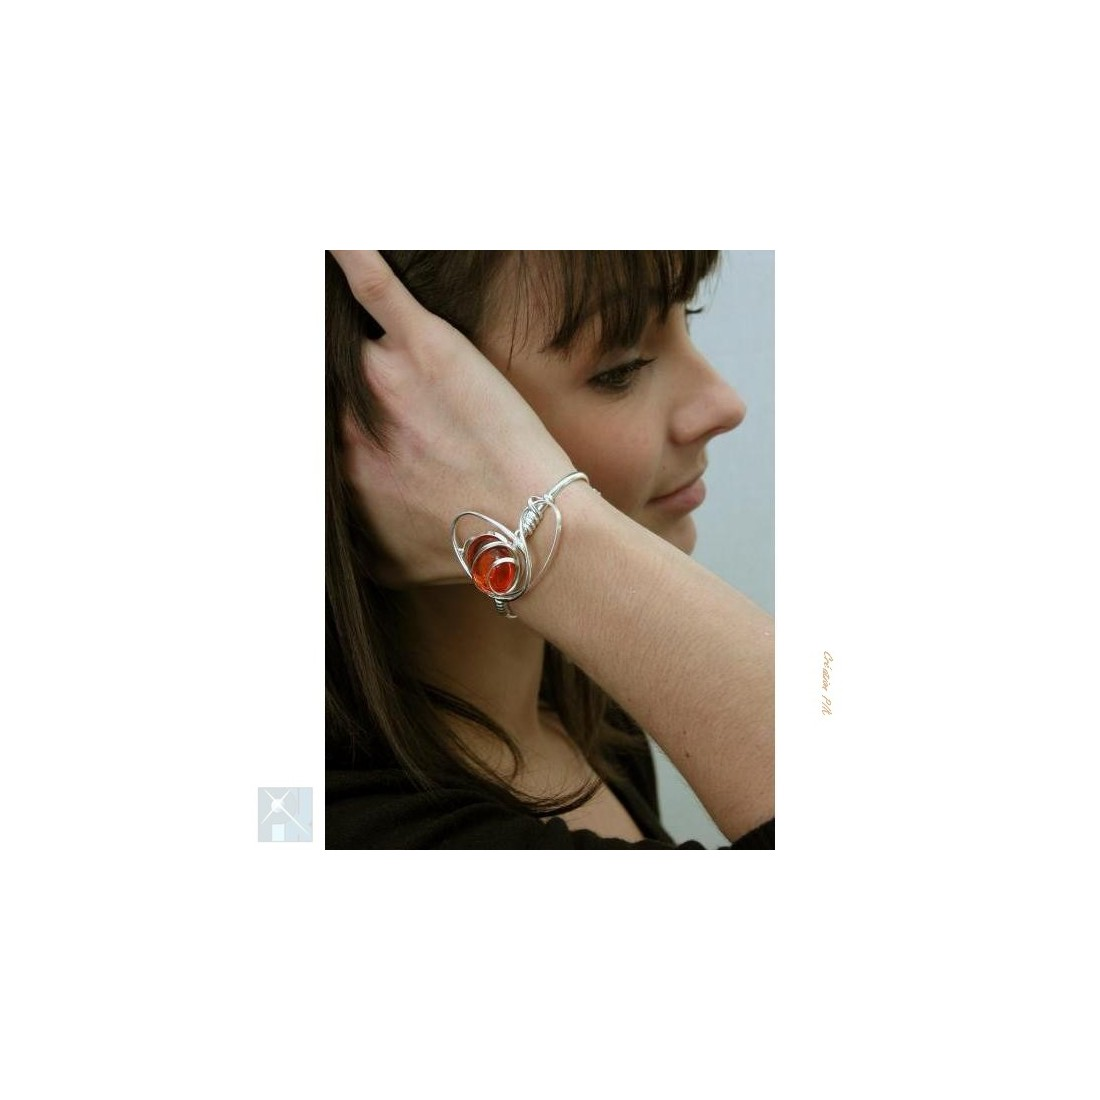 Bracelet argent et orange ajustable